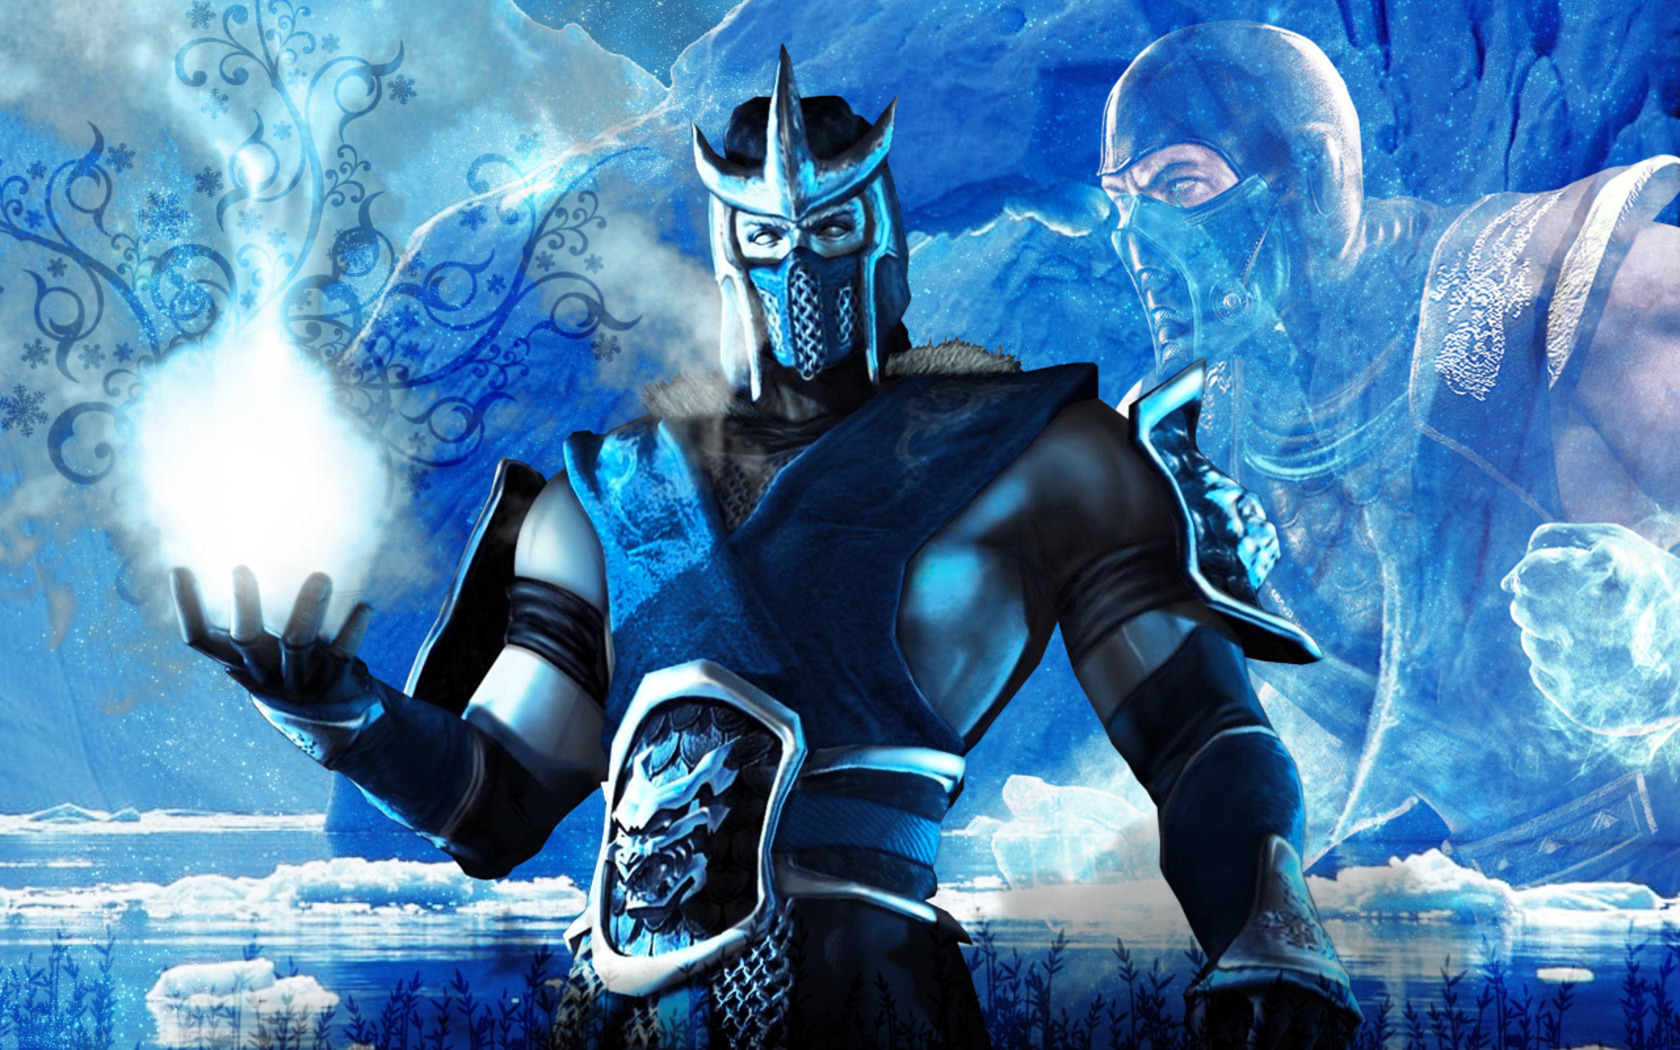 Free Download Mortal Kombat Sub Zero Wallpaper Forwallpapercom